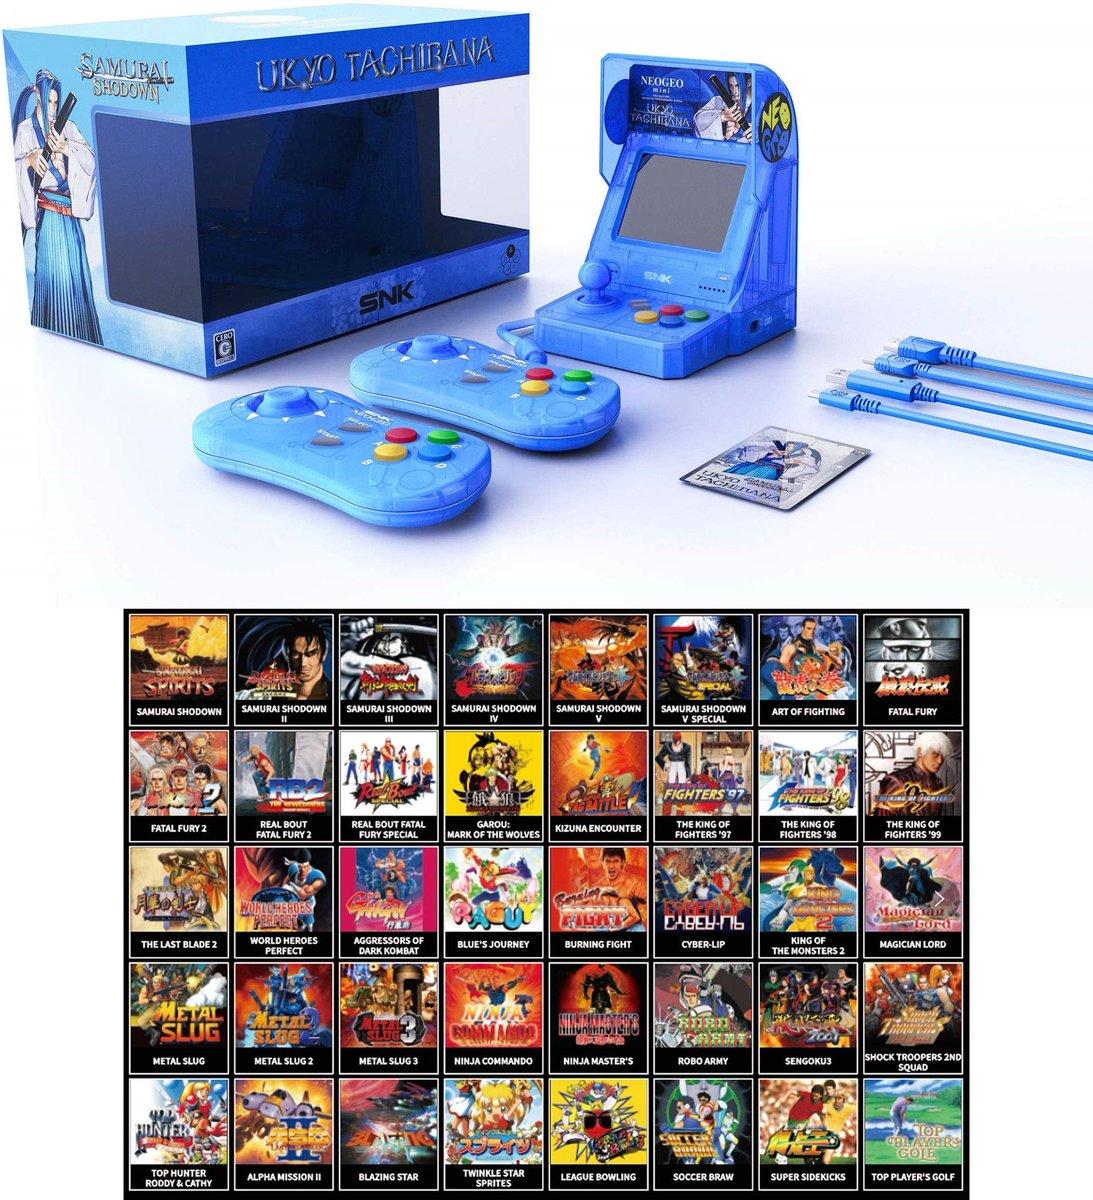 SNK NEOGEO Mini Samurai Shodown Limited Edition Bundle: Ukyo Tachibana is $88.39 on Amazon 2